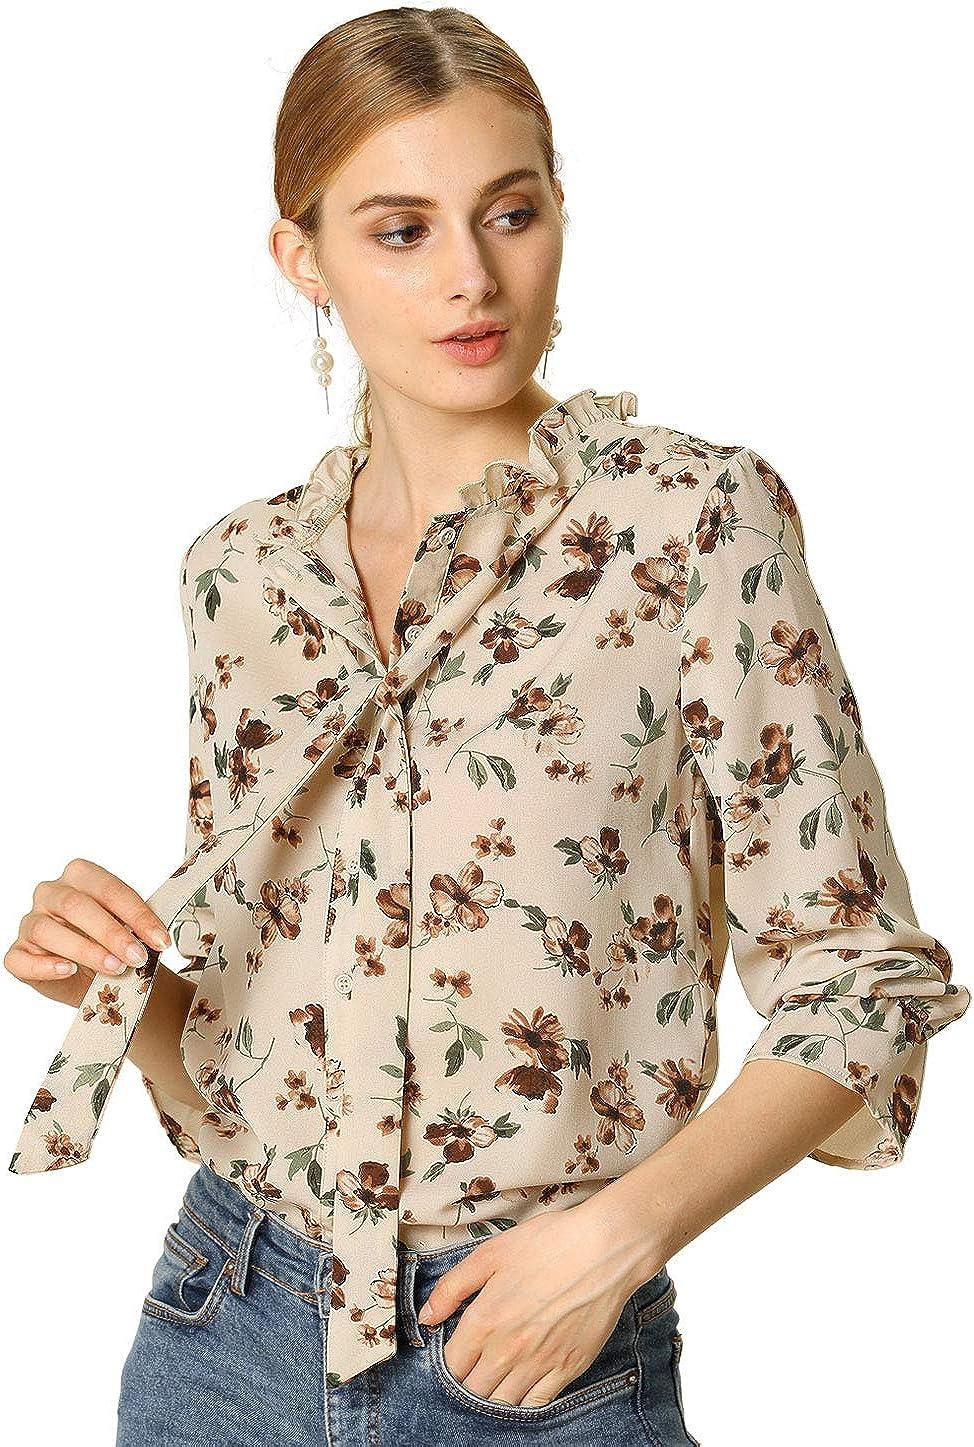 Allegra K Women's Bow Tie Ruffle Collar Button Down Long Sleeve Chiffon Vintage Floral Blouse